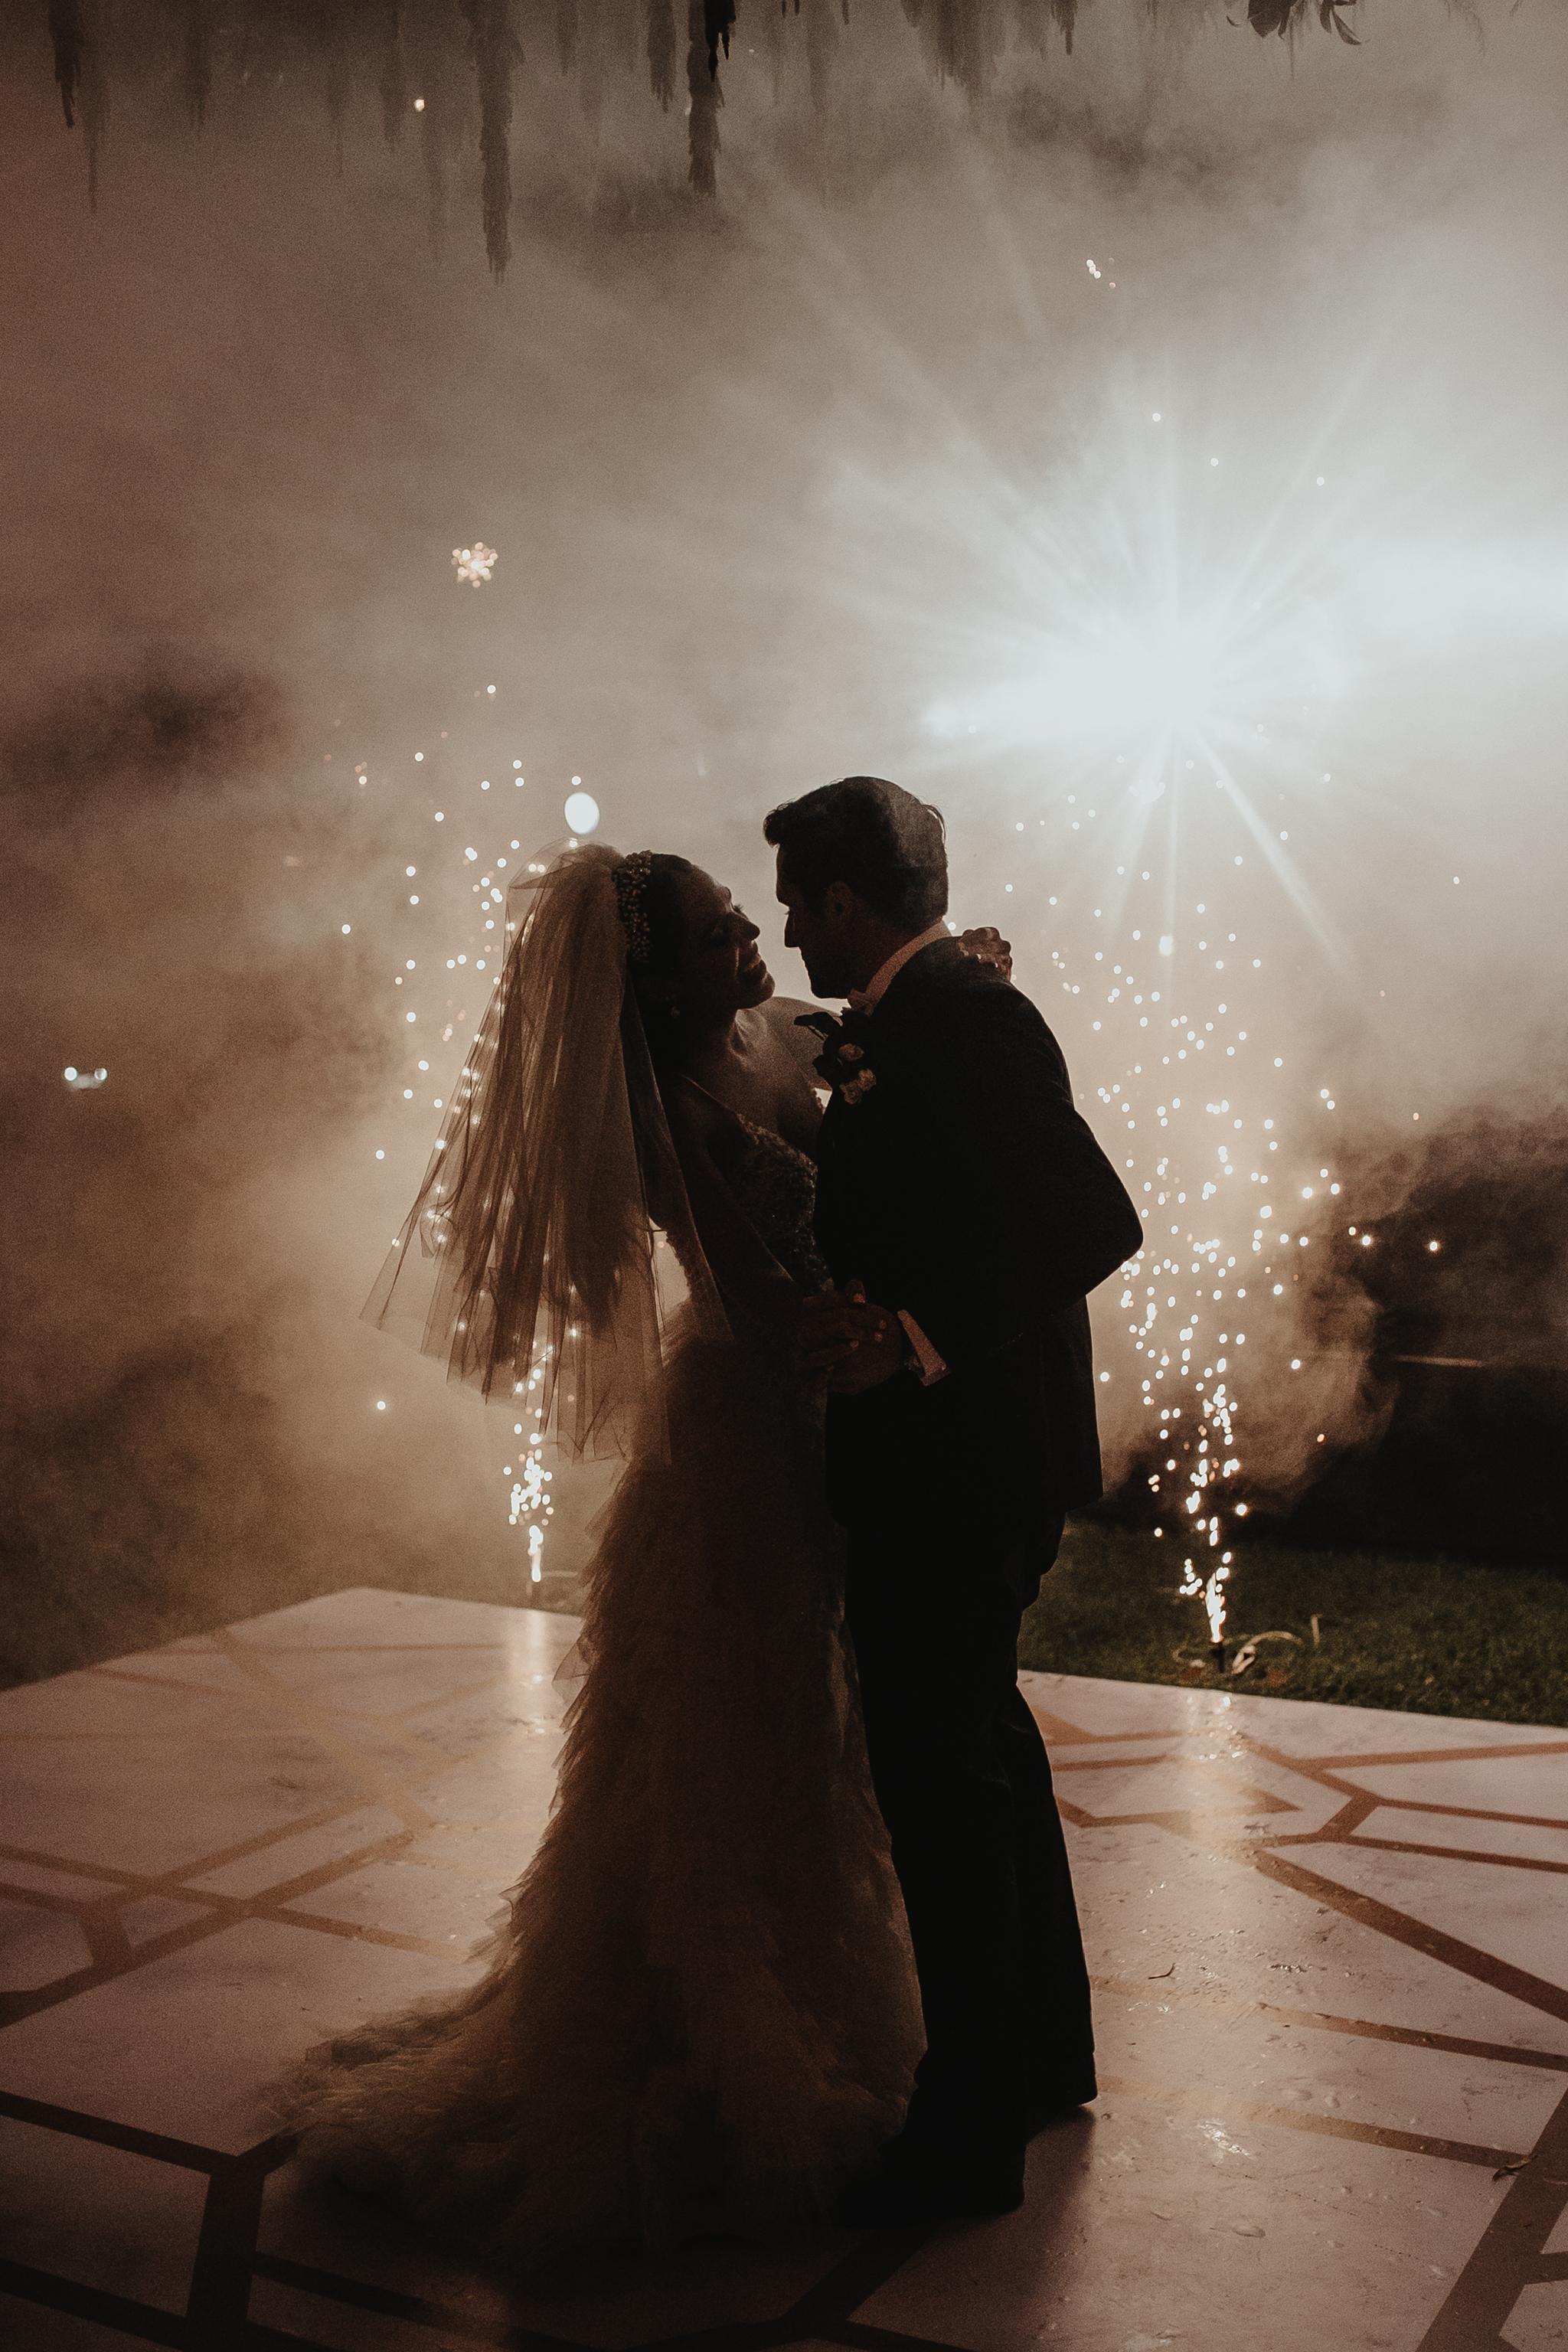 1118R&F__WeddingDestination_Weddingmerida_BodaMexico_FotografoDeBodas_FabrizioSimoneenFotografo.jpg